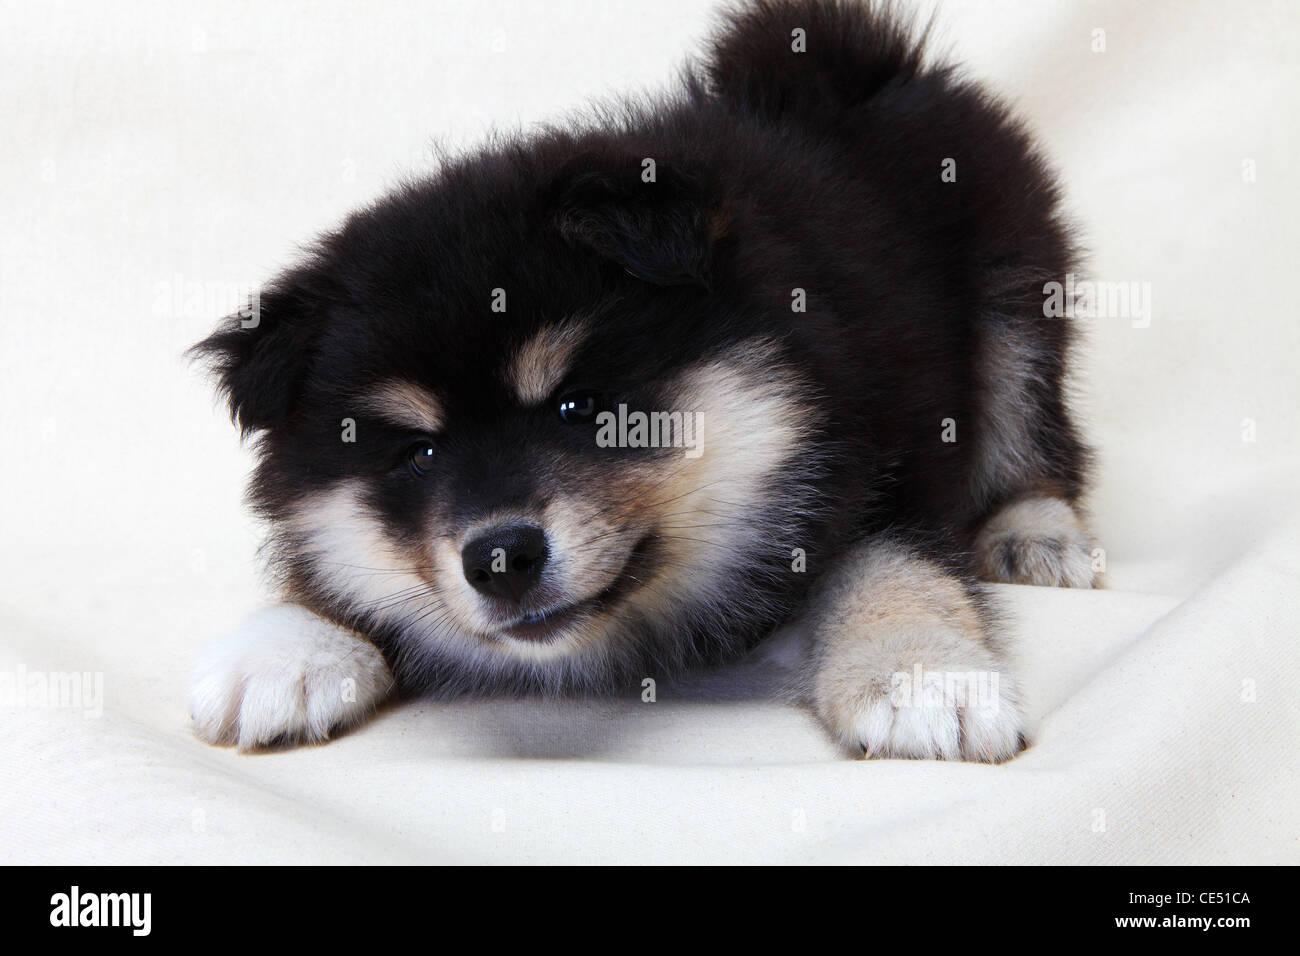 A Finnish Lapphund puppy - Stock Image